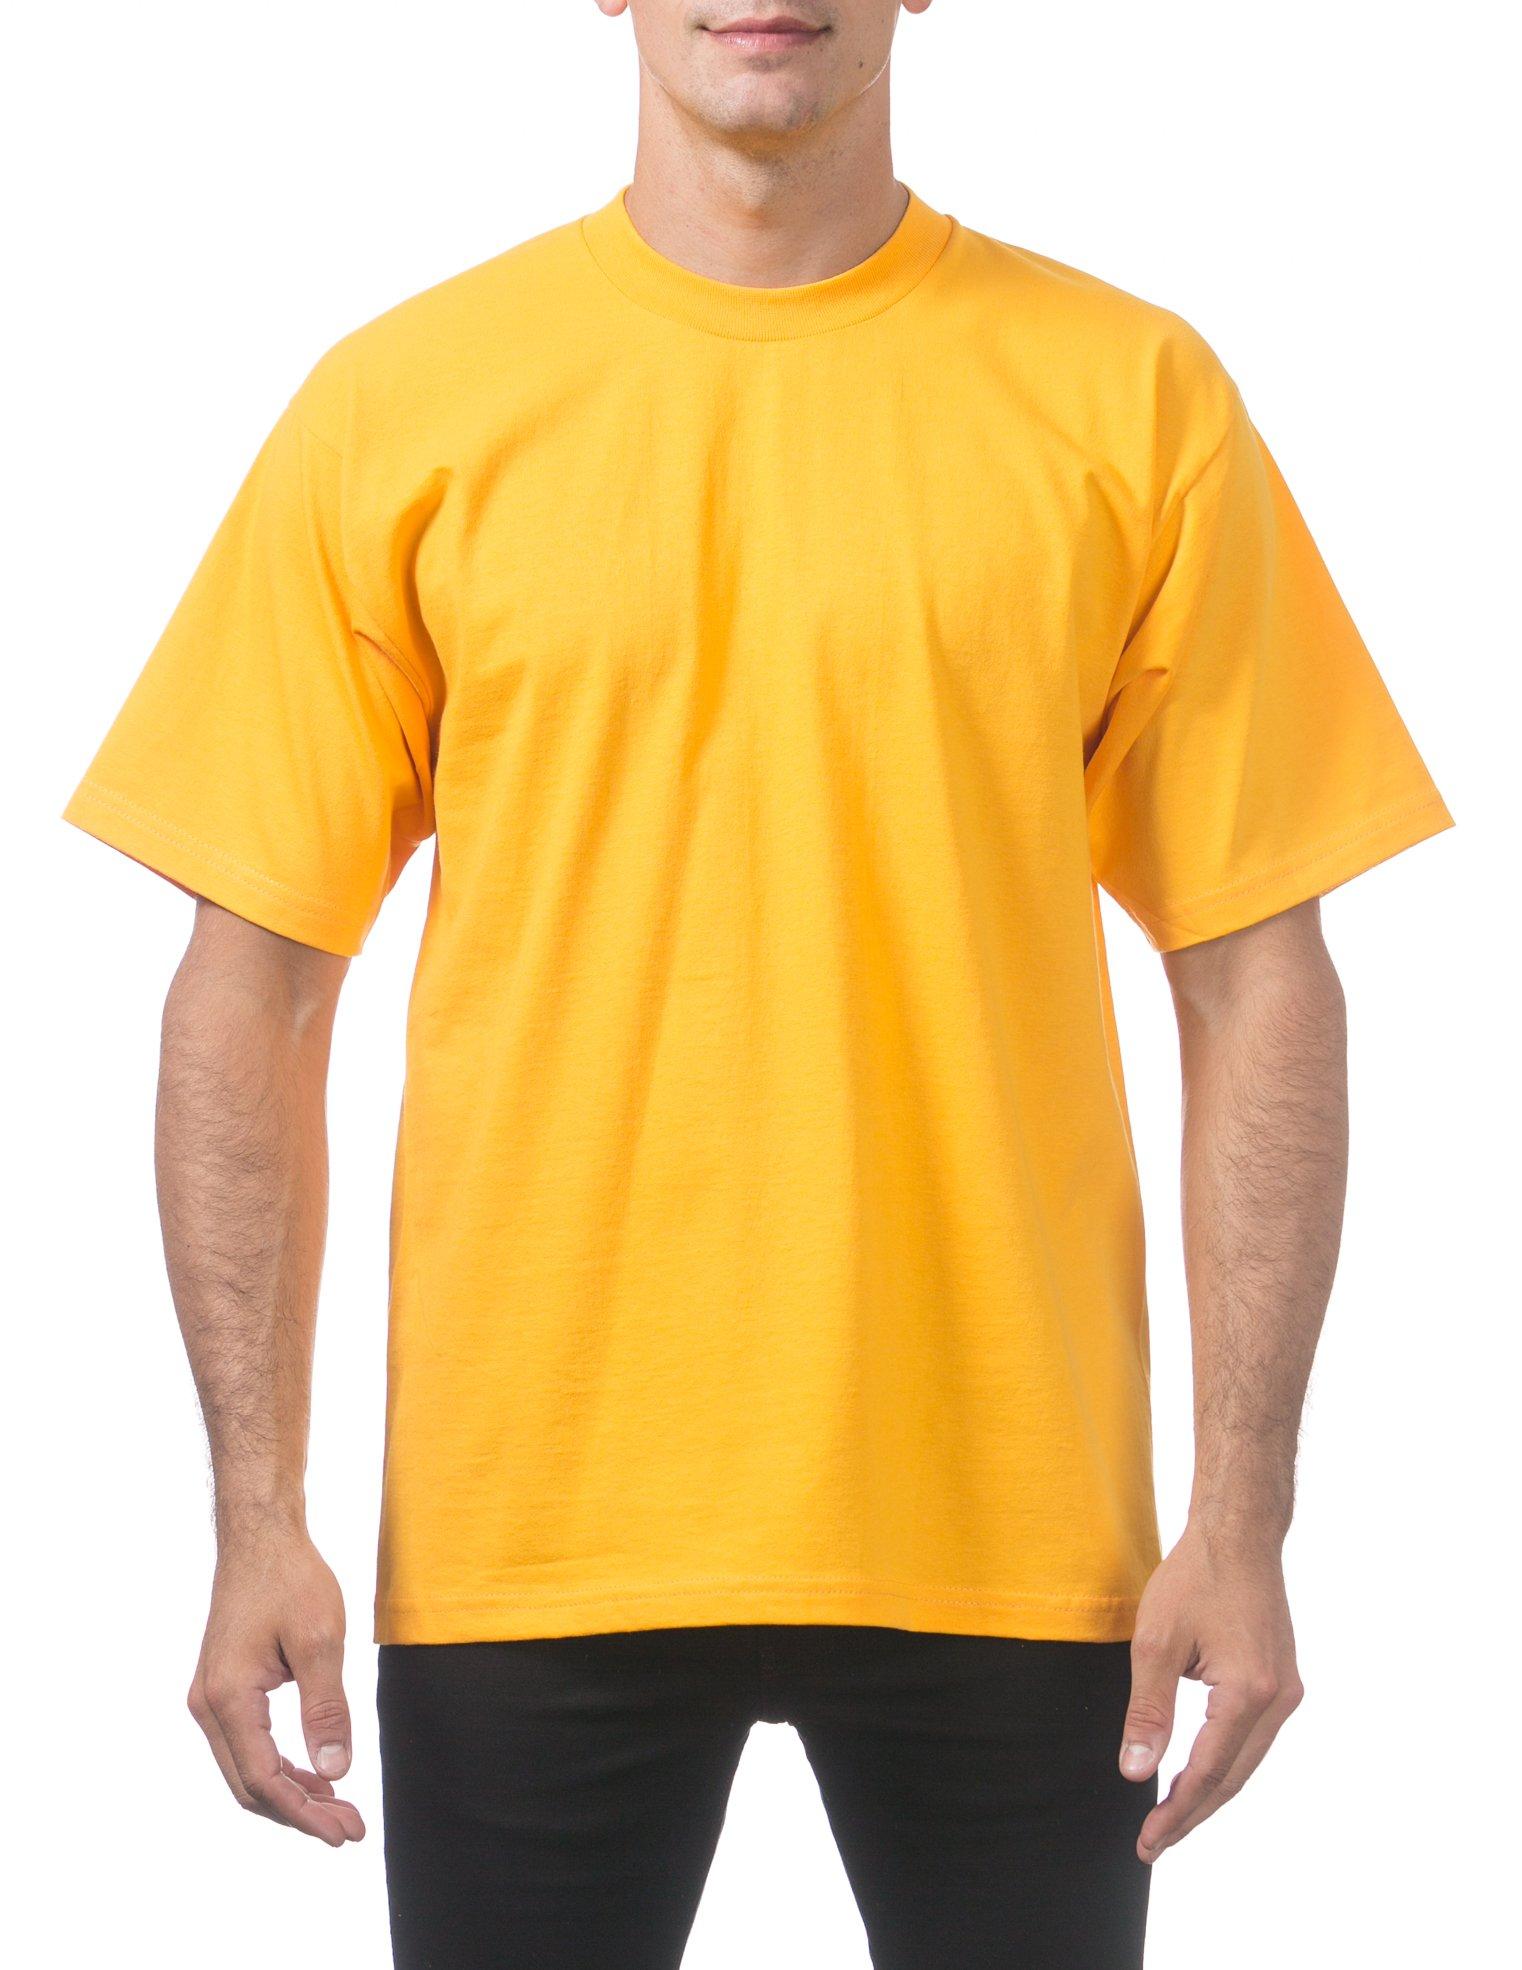 Pro Club Men's Heavyweight Cotton Short Sleeve Crew Neck T-Shirt, Medium, Gold